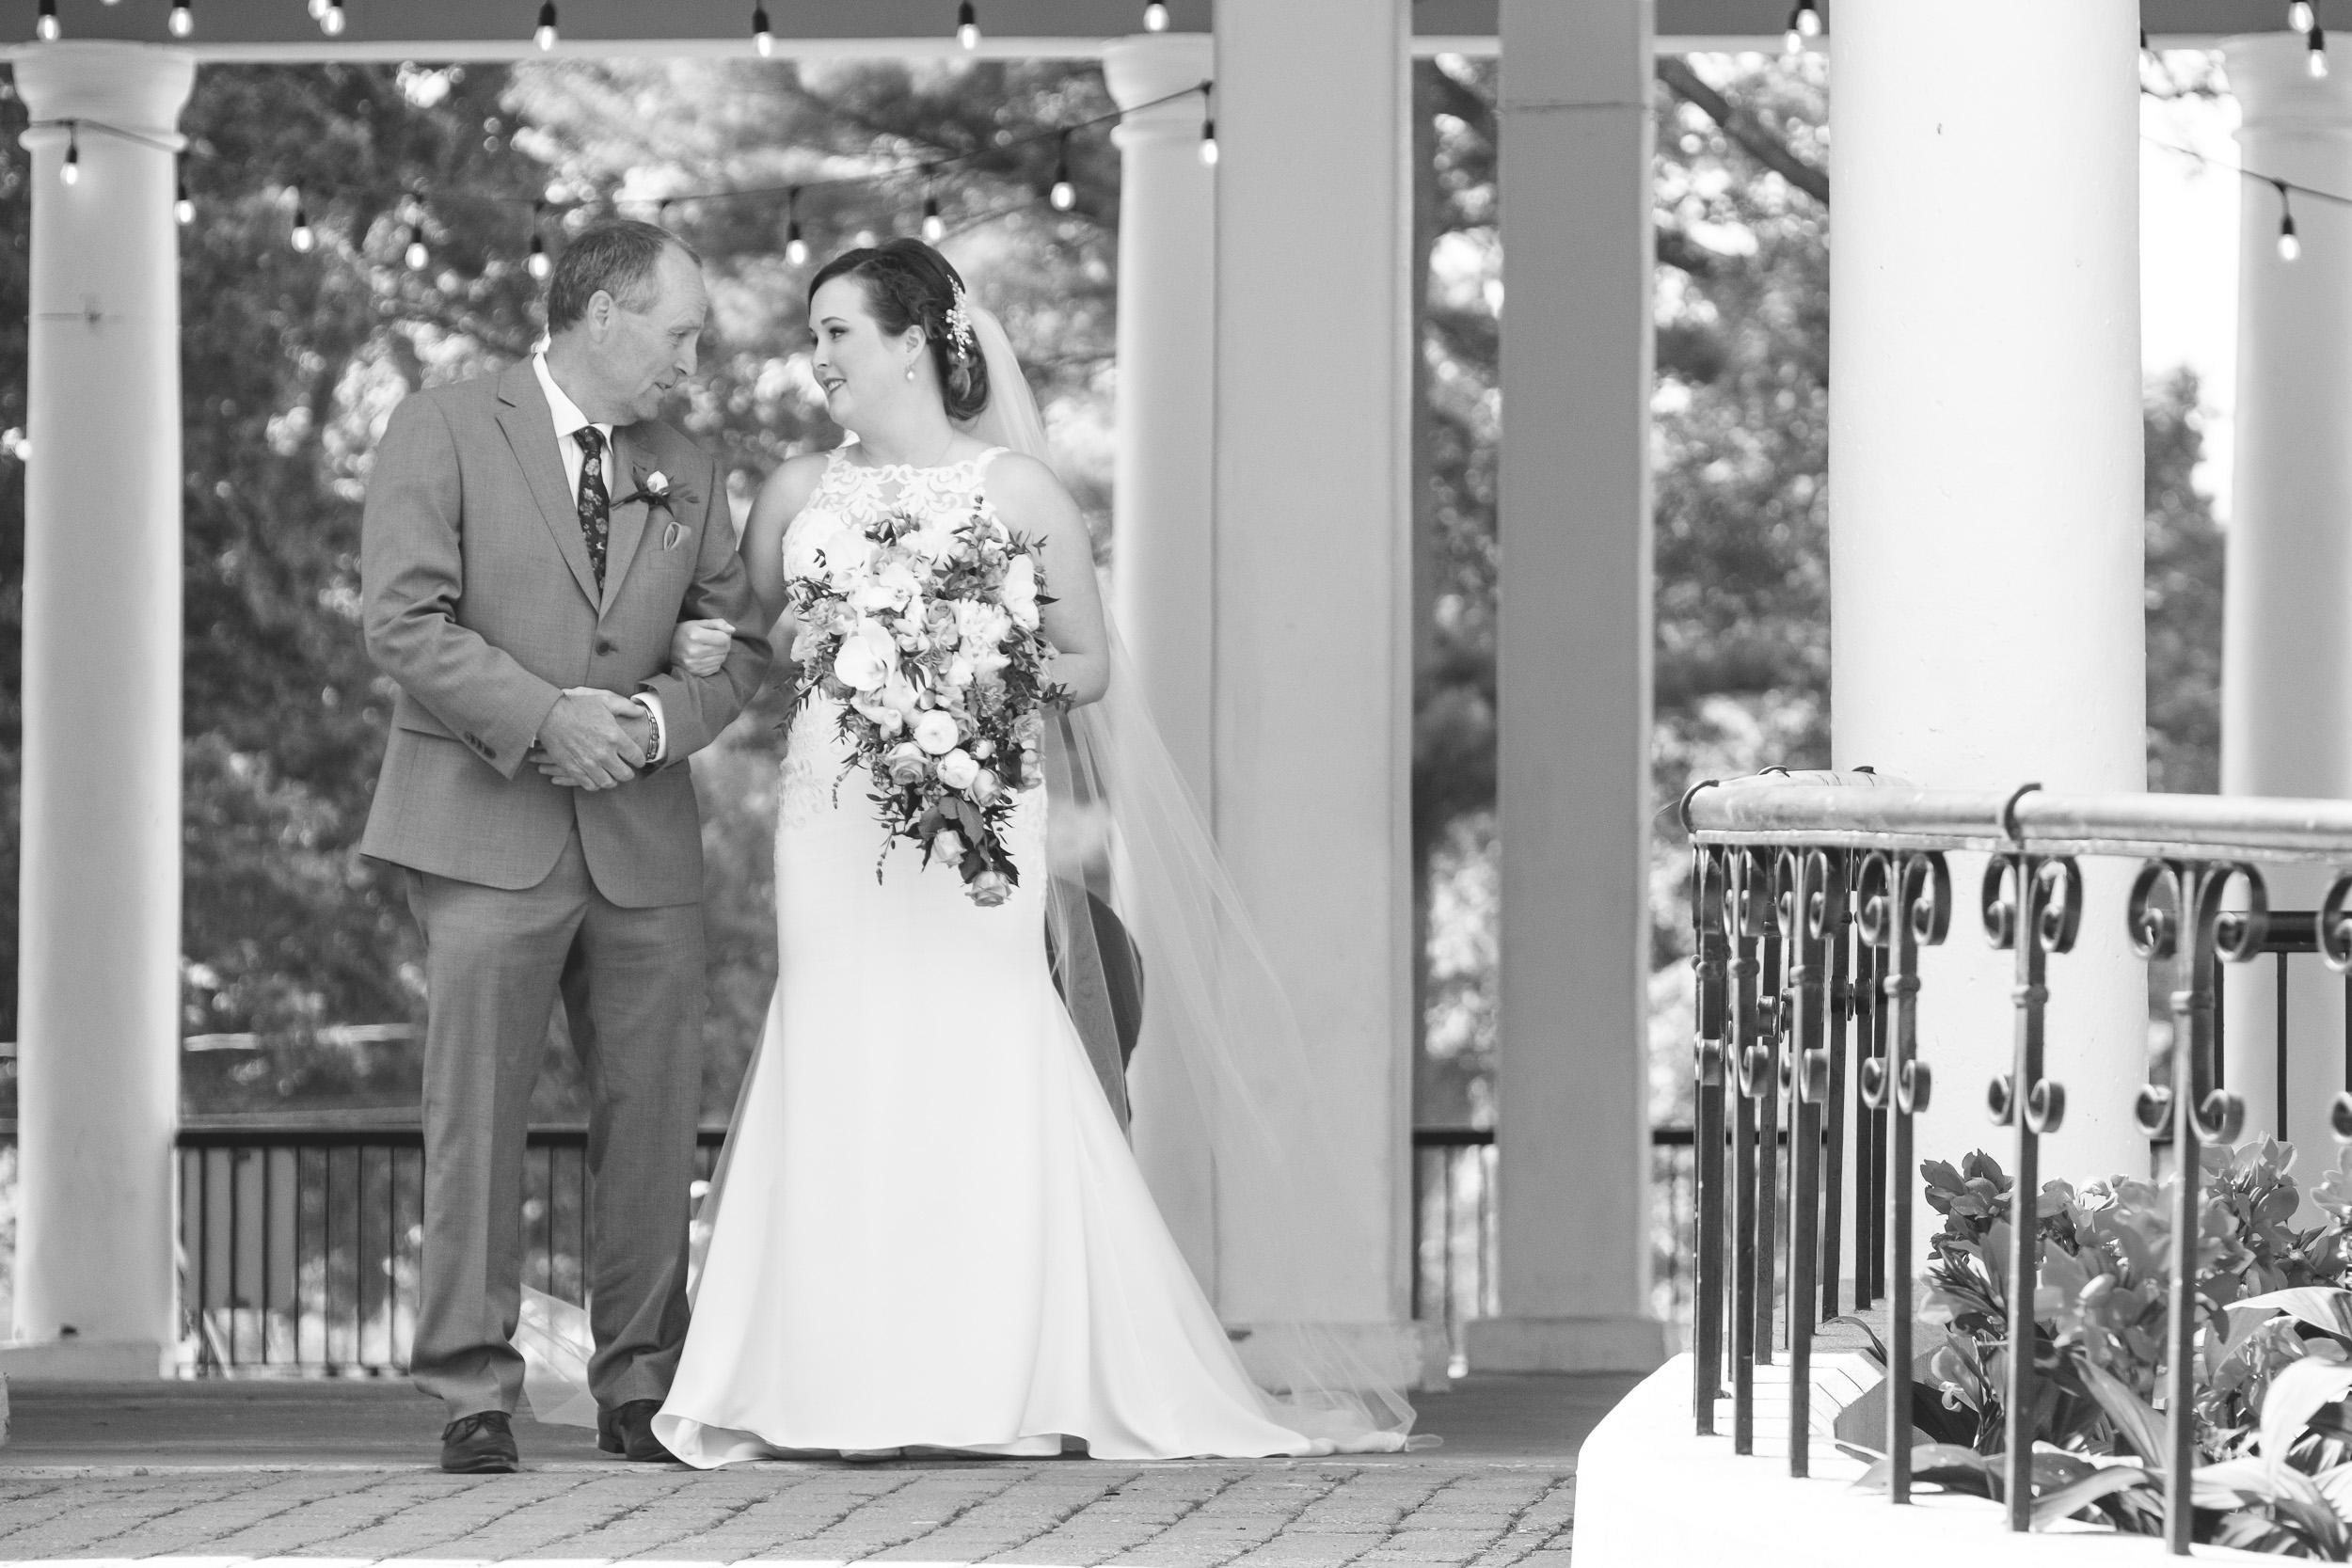 FumioWeddings - Real Weddings mixed-59.jpg